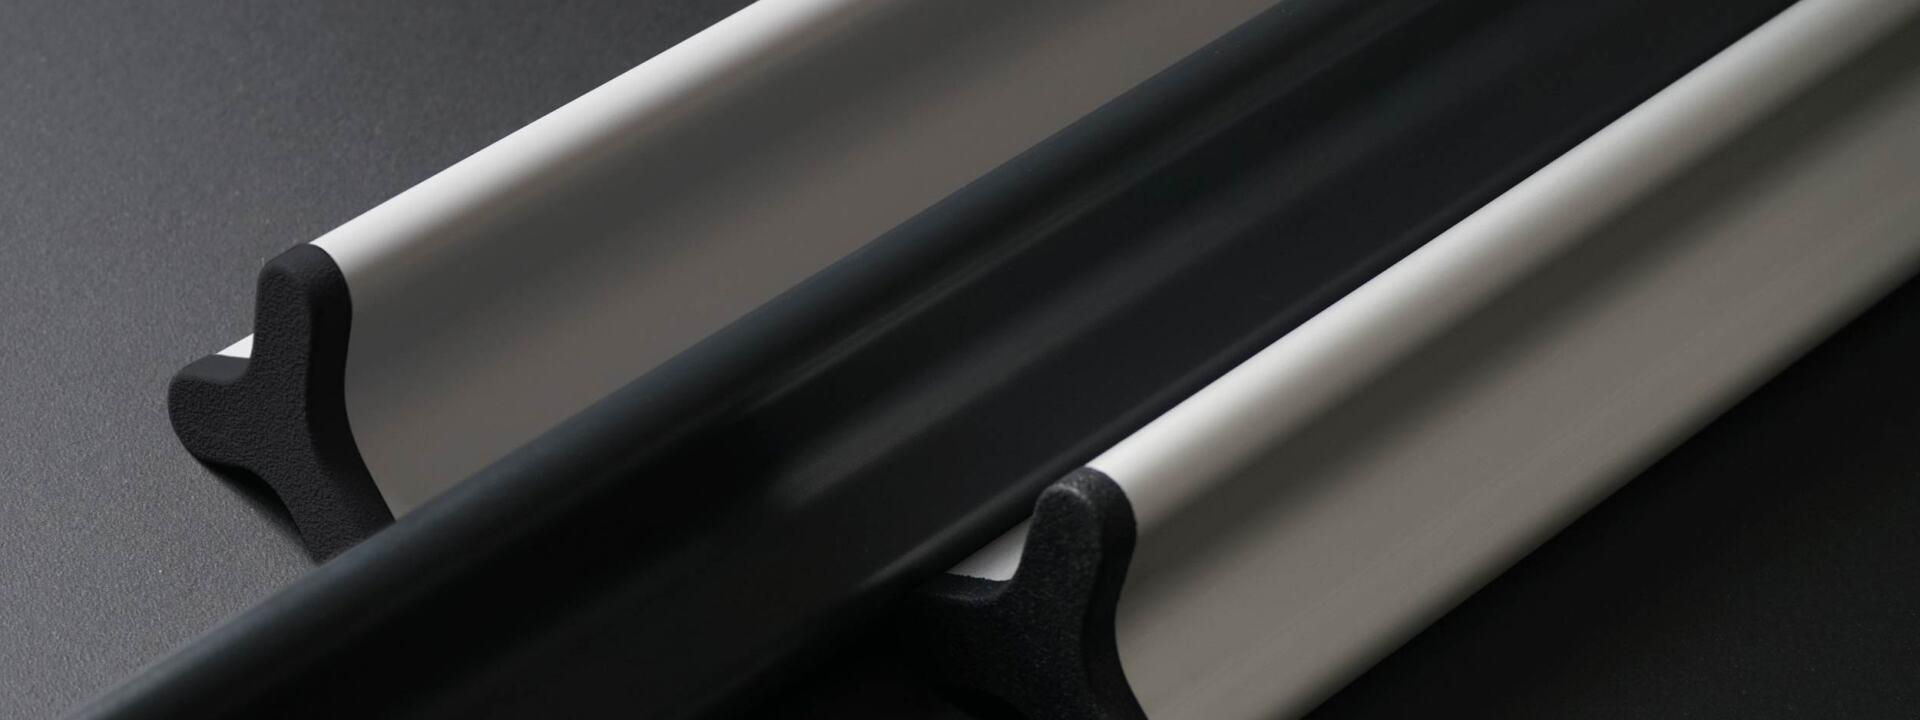 Beam Leg, Table Frames, Table bases, Linoleum Table Top, Table legs